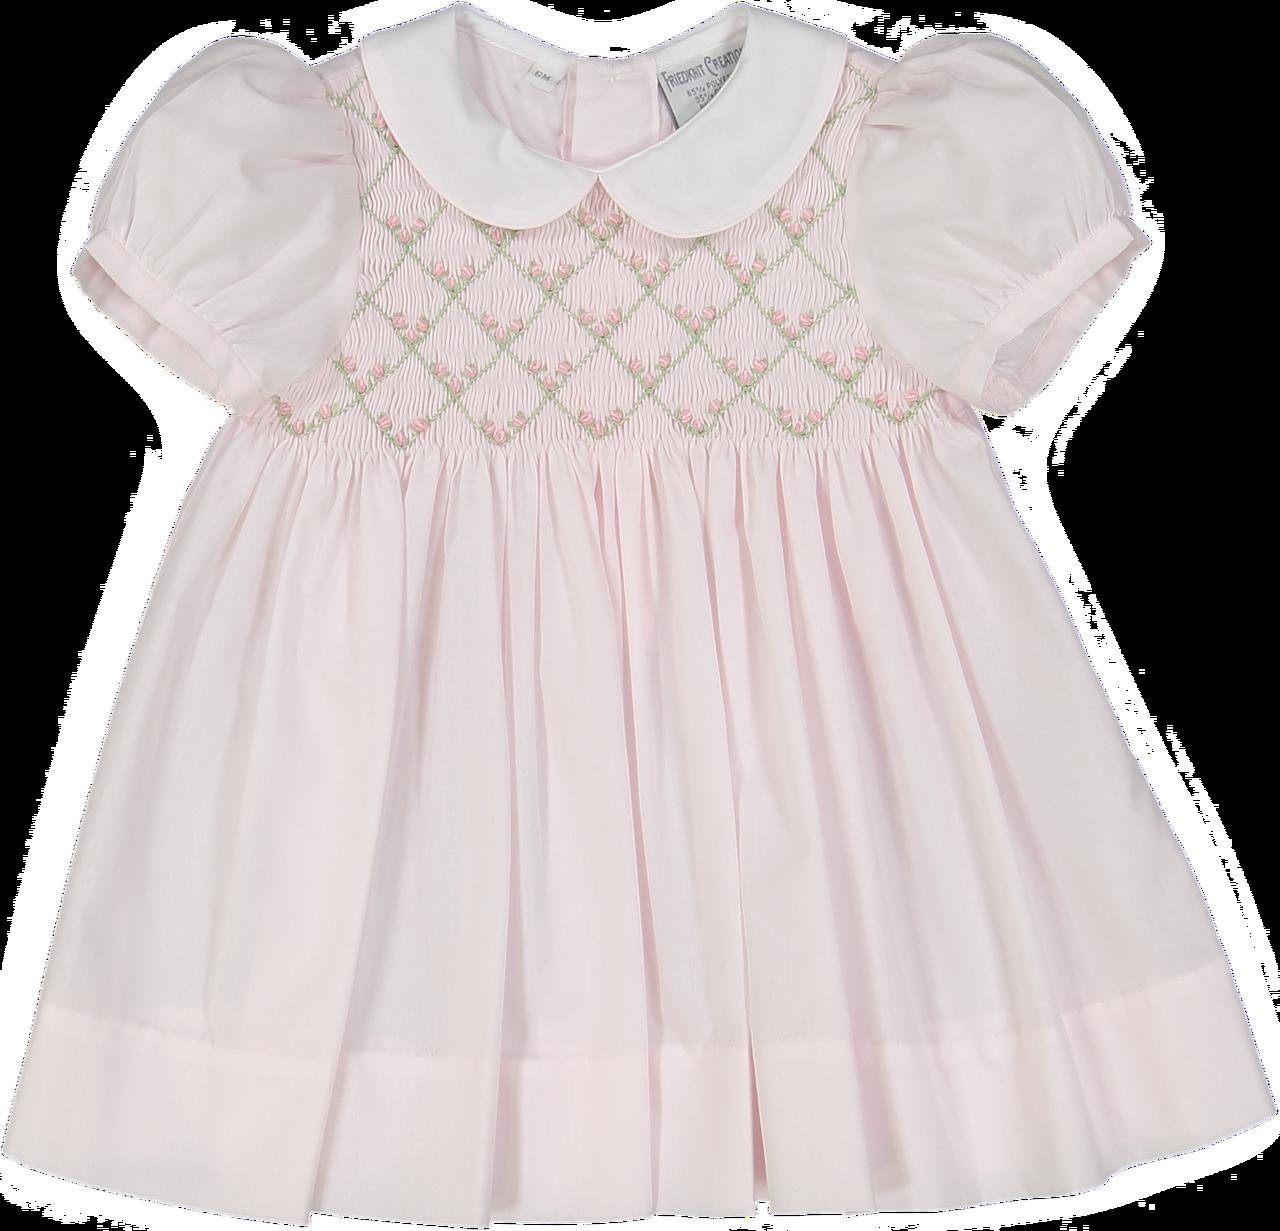 FREE SHIPPING Smocked Dress Smocked Rosebud Dress